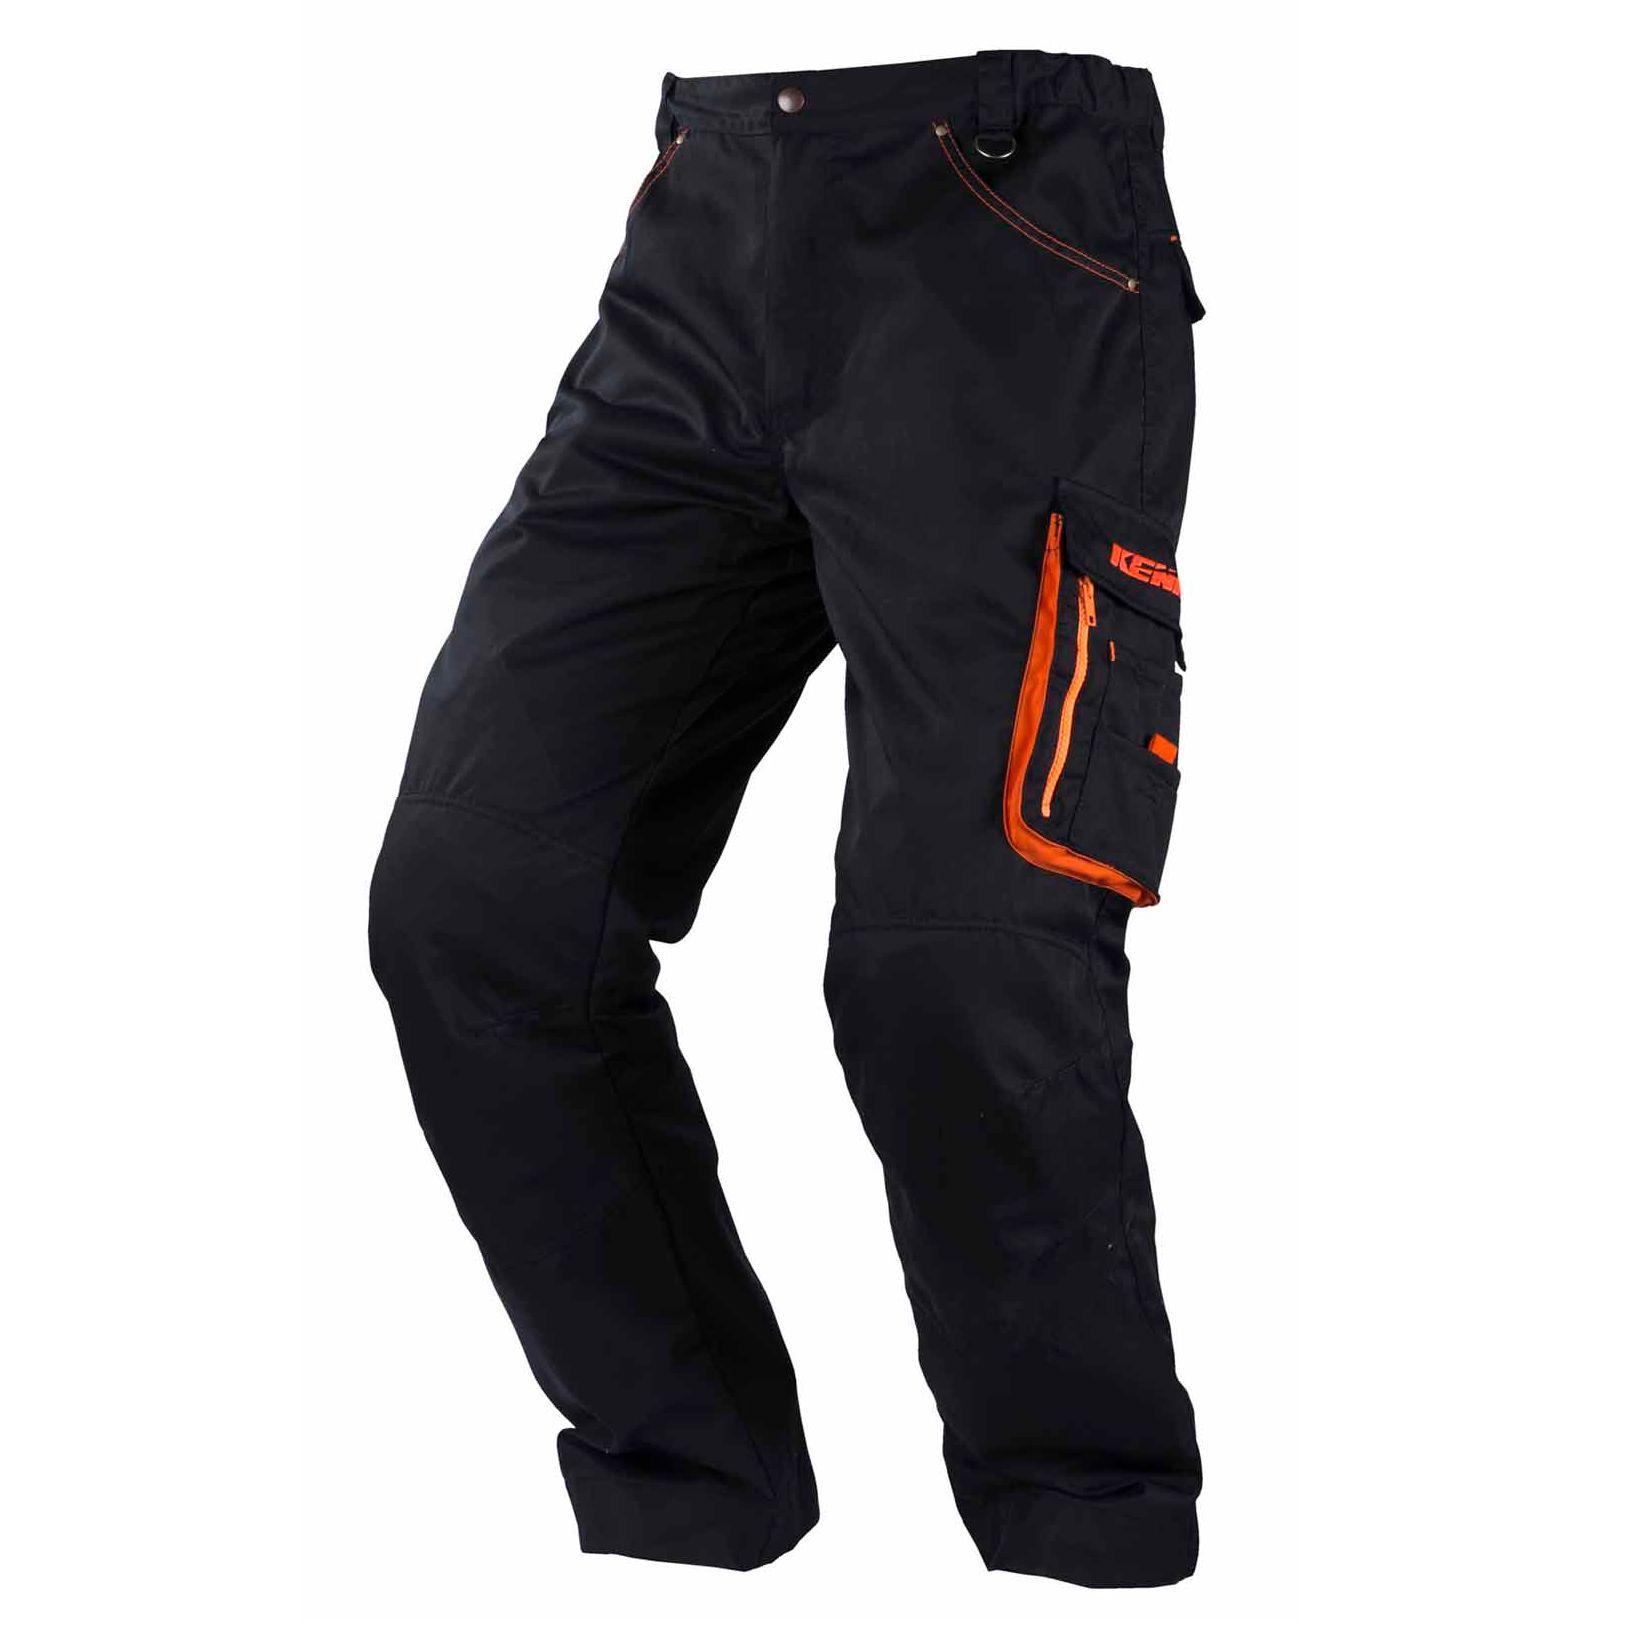 Pantalon Kenny Racing - 2018